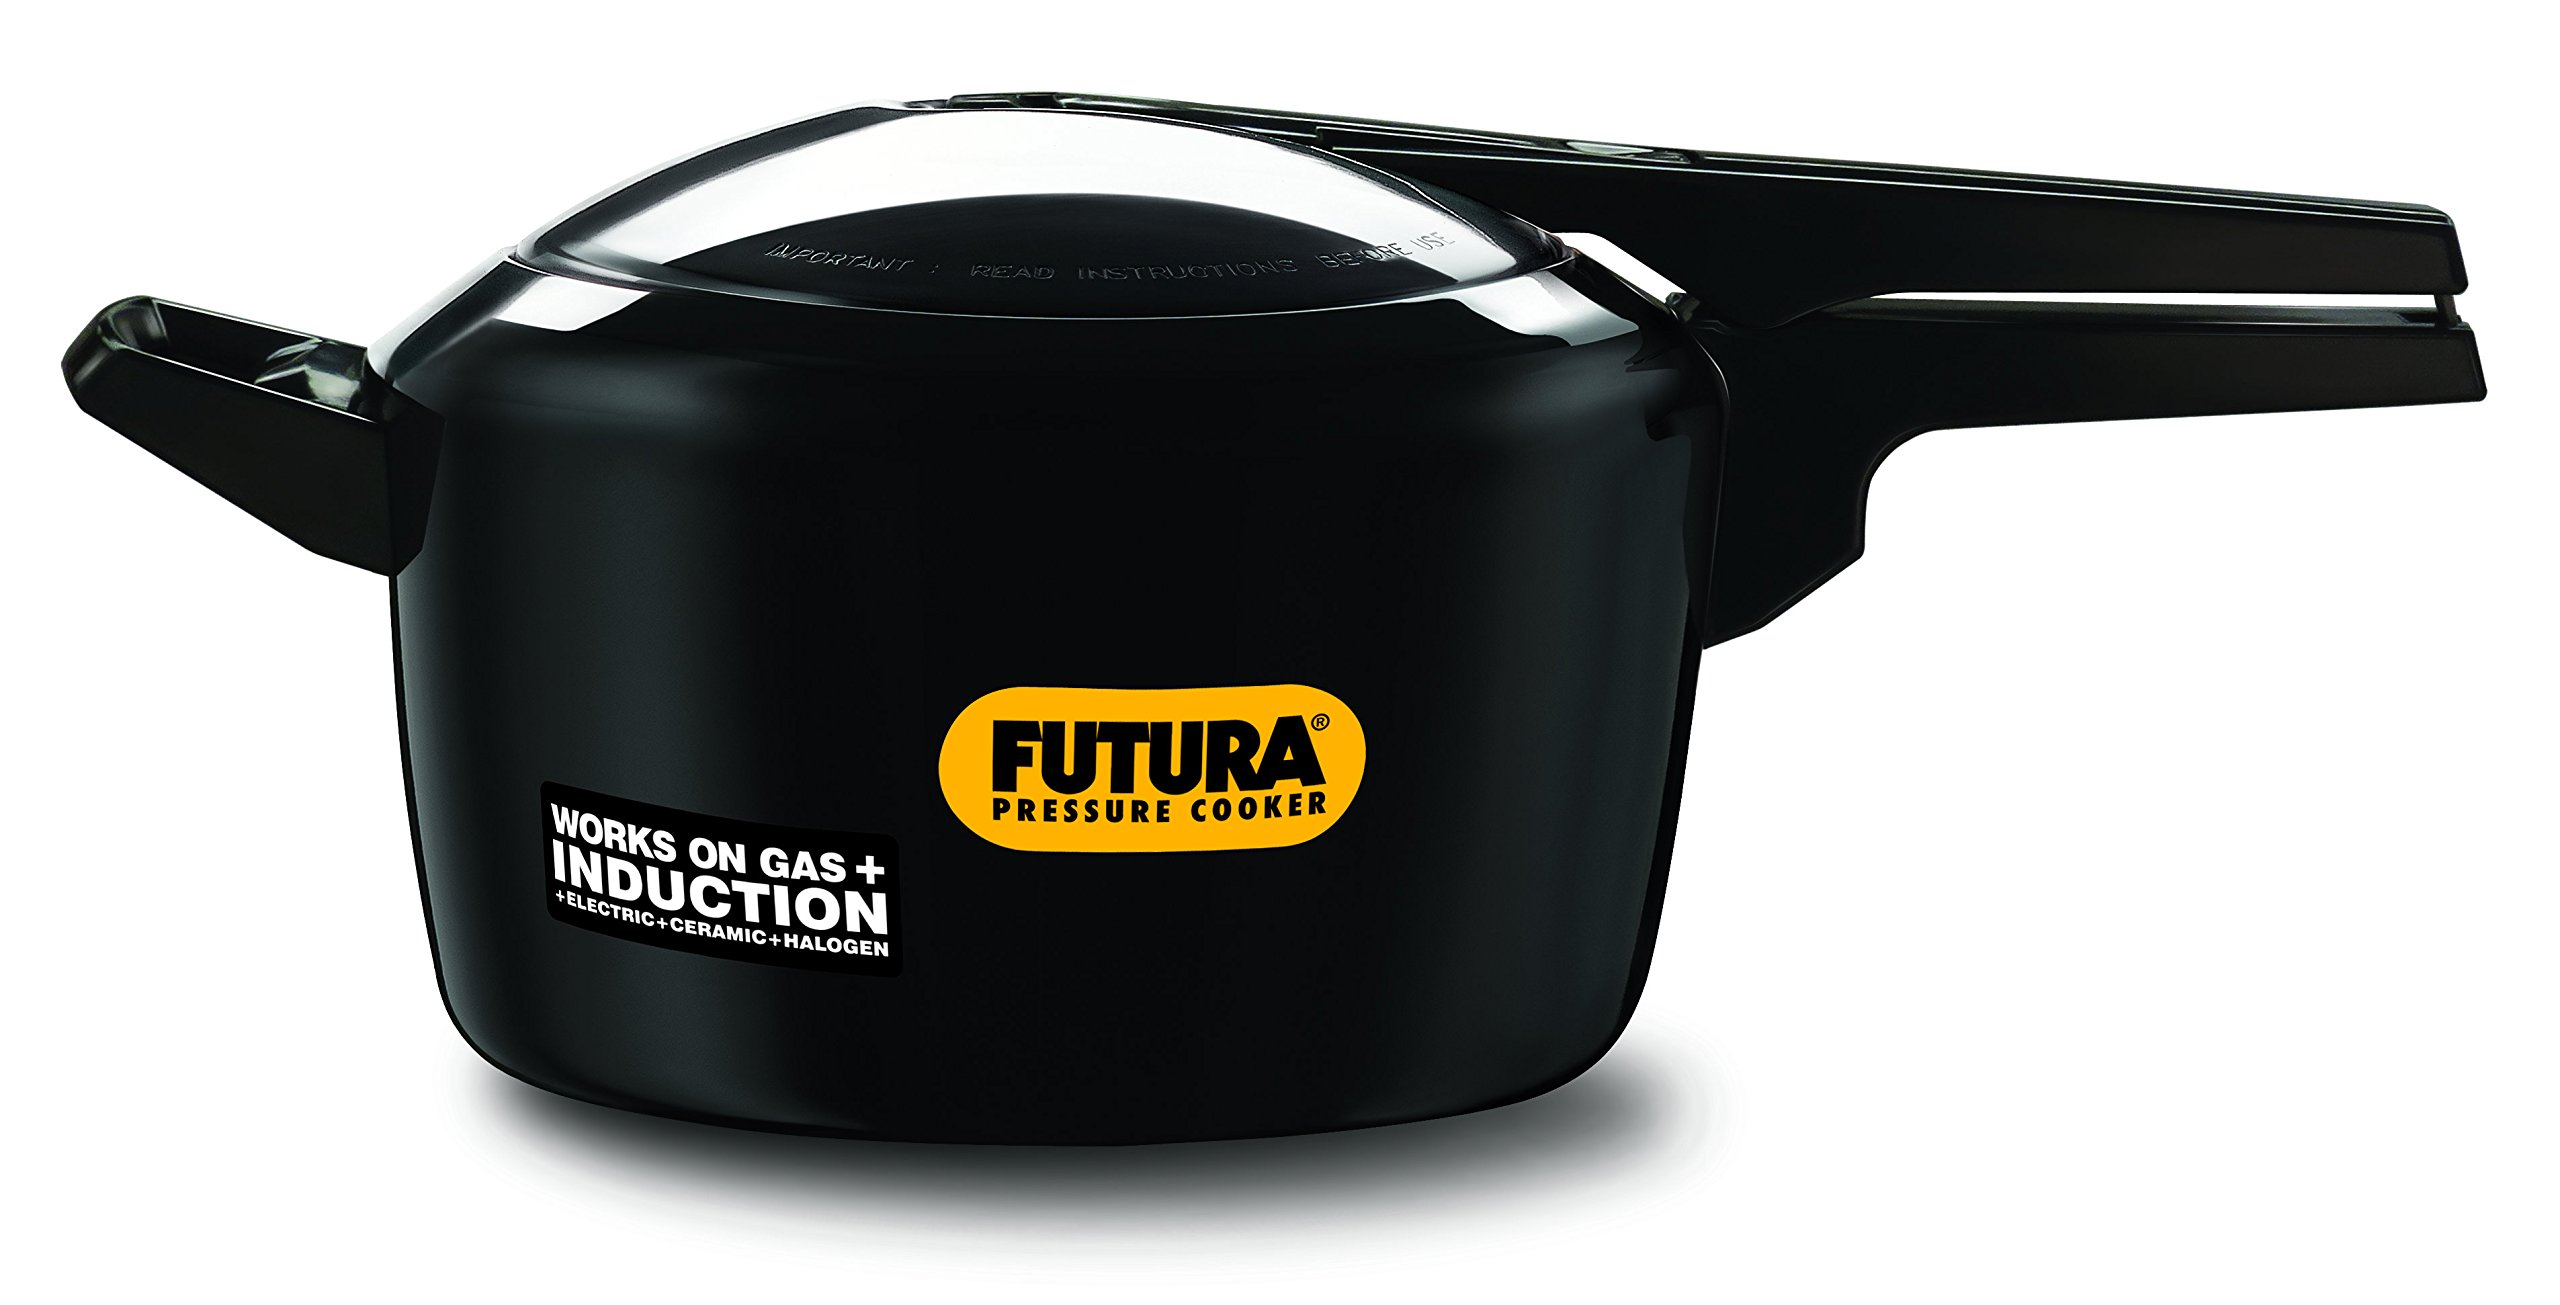 Futura 5-Litre Hard Anodized Induction Compatible Pressure Cooker, Small, Black